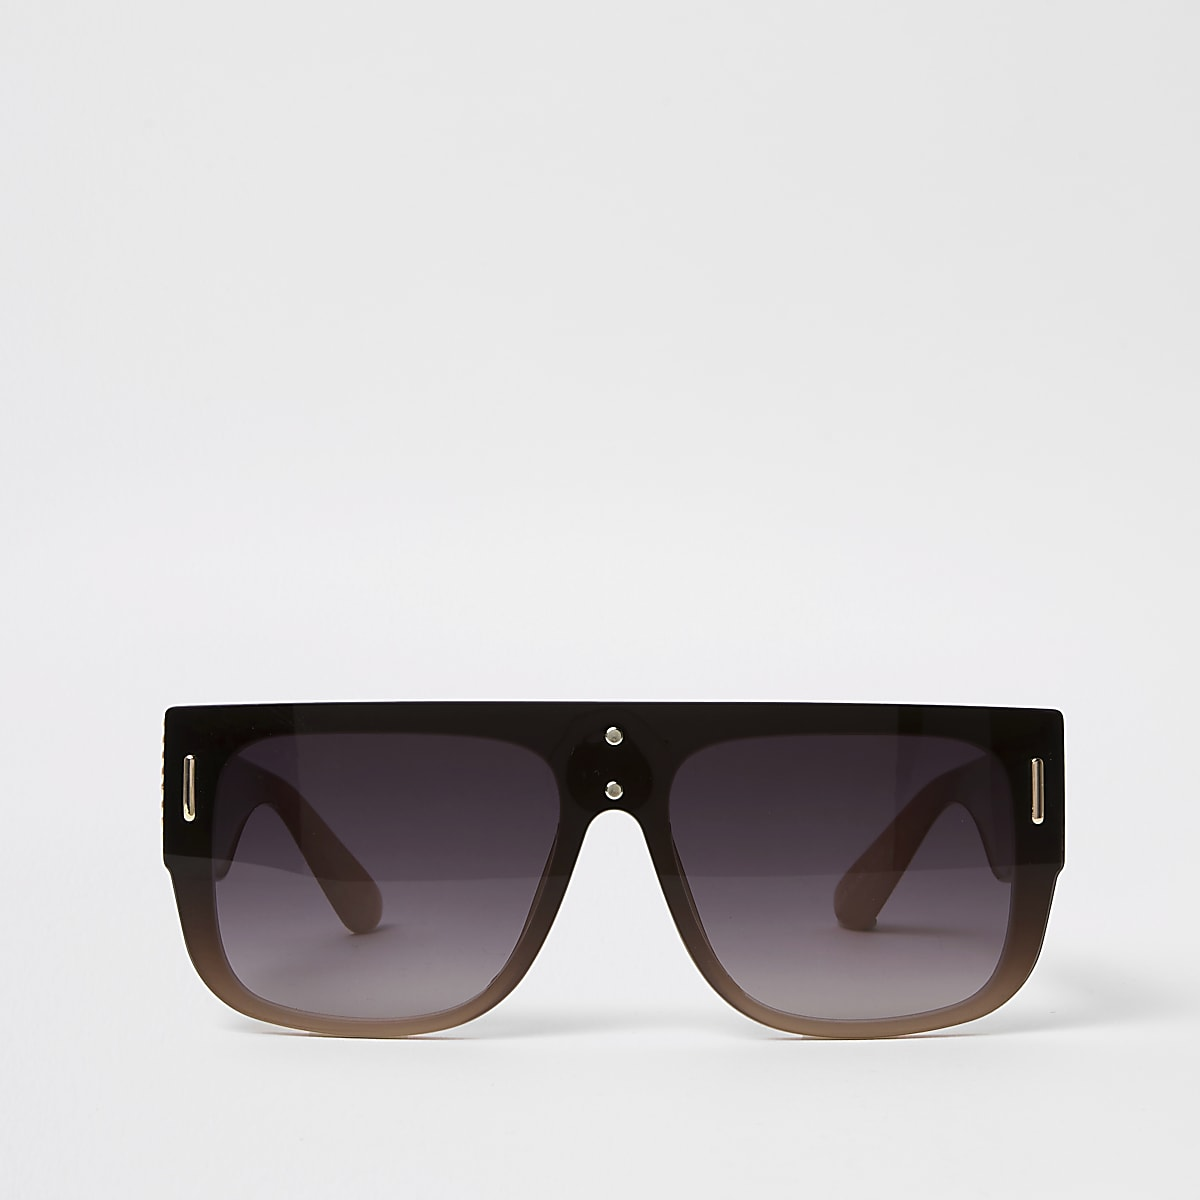 Black smoke lens flat top sunglasses